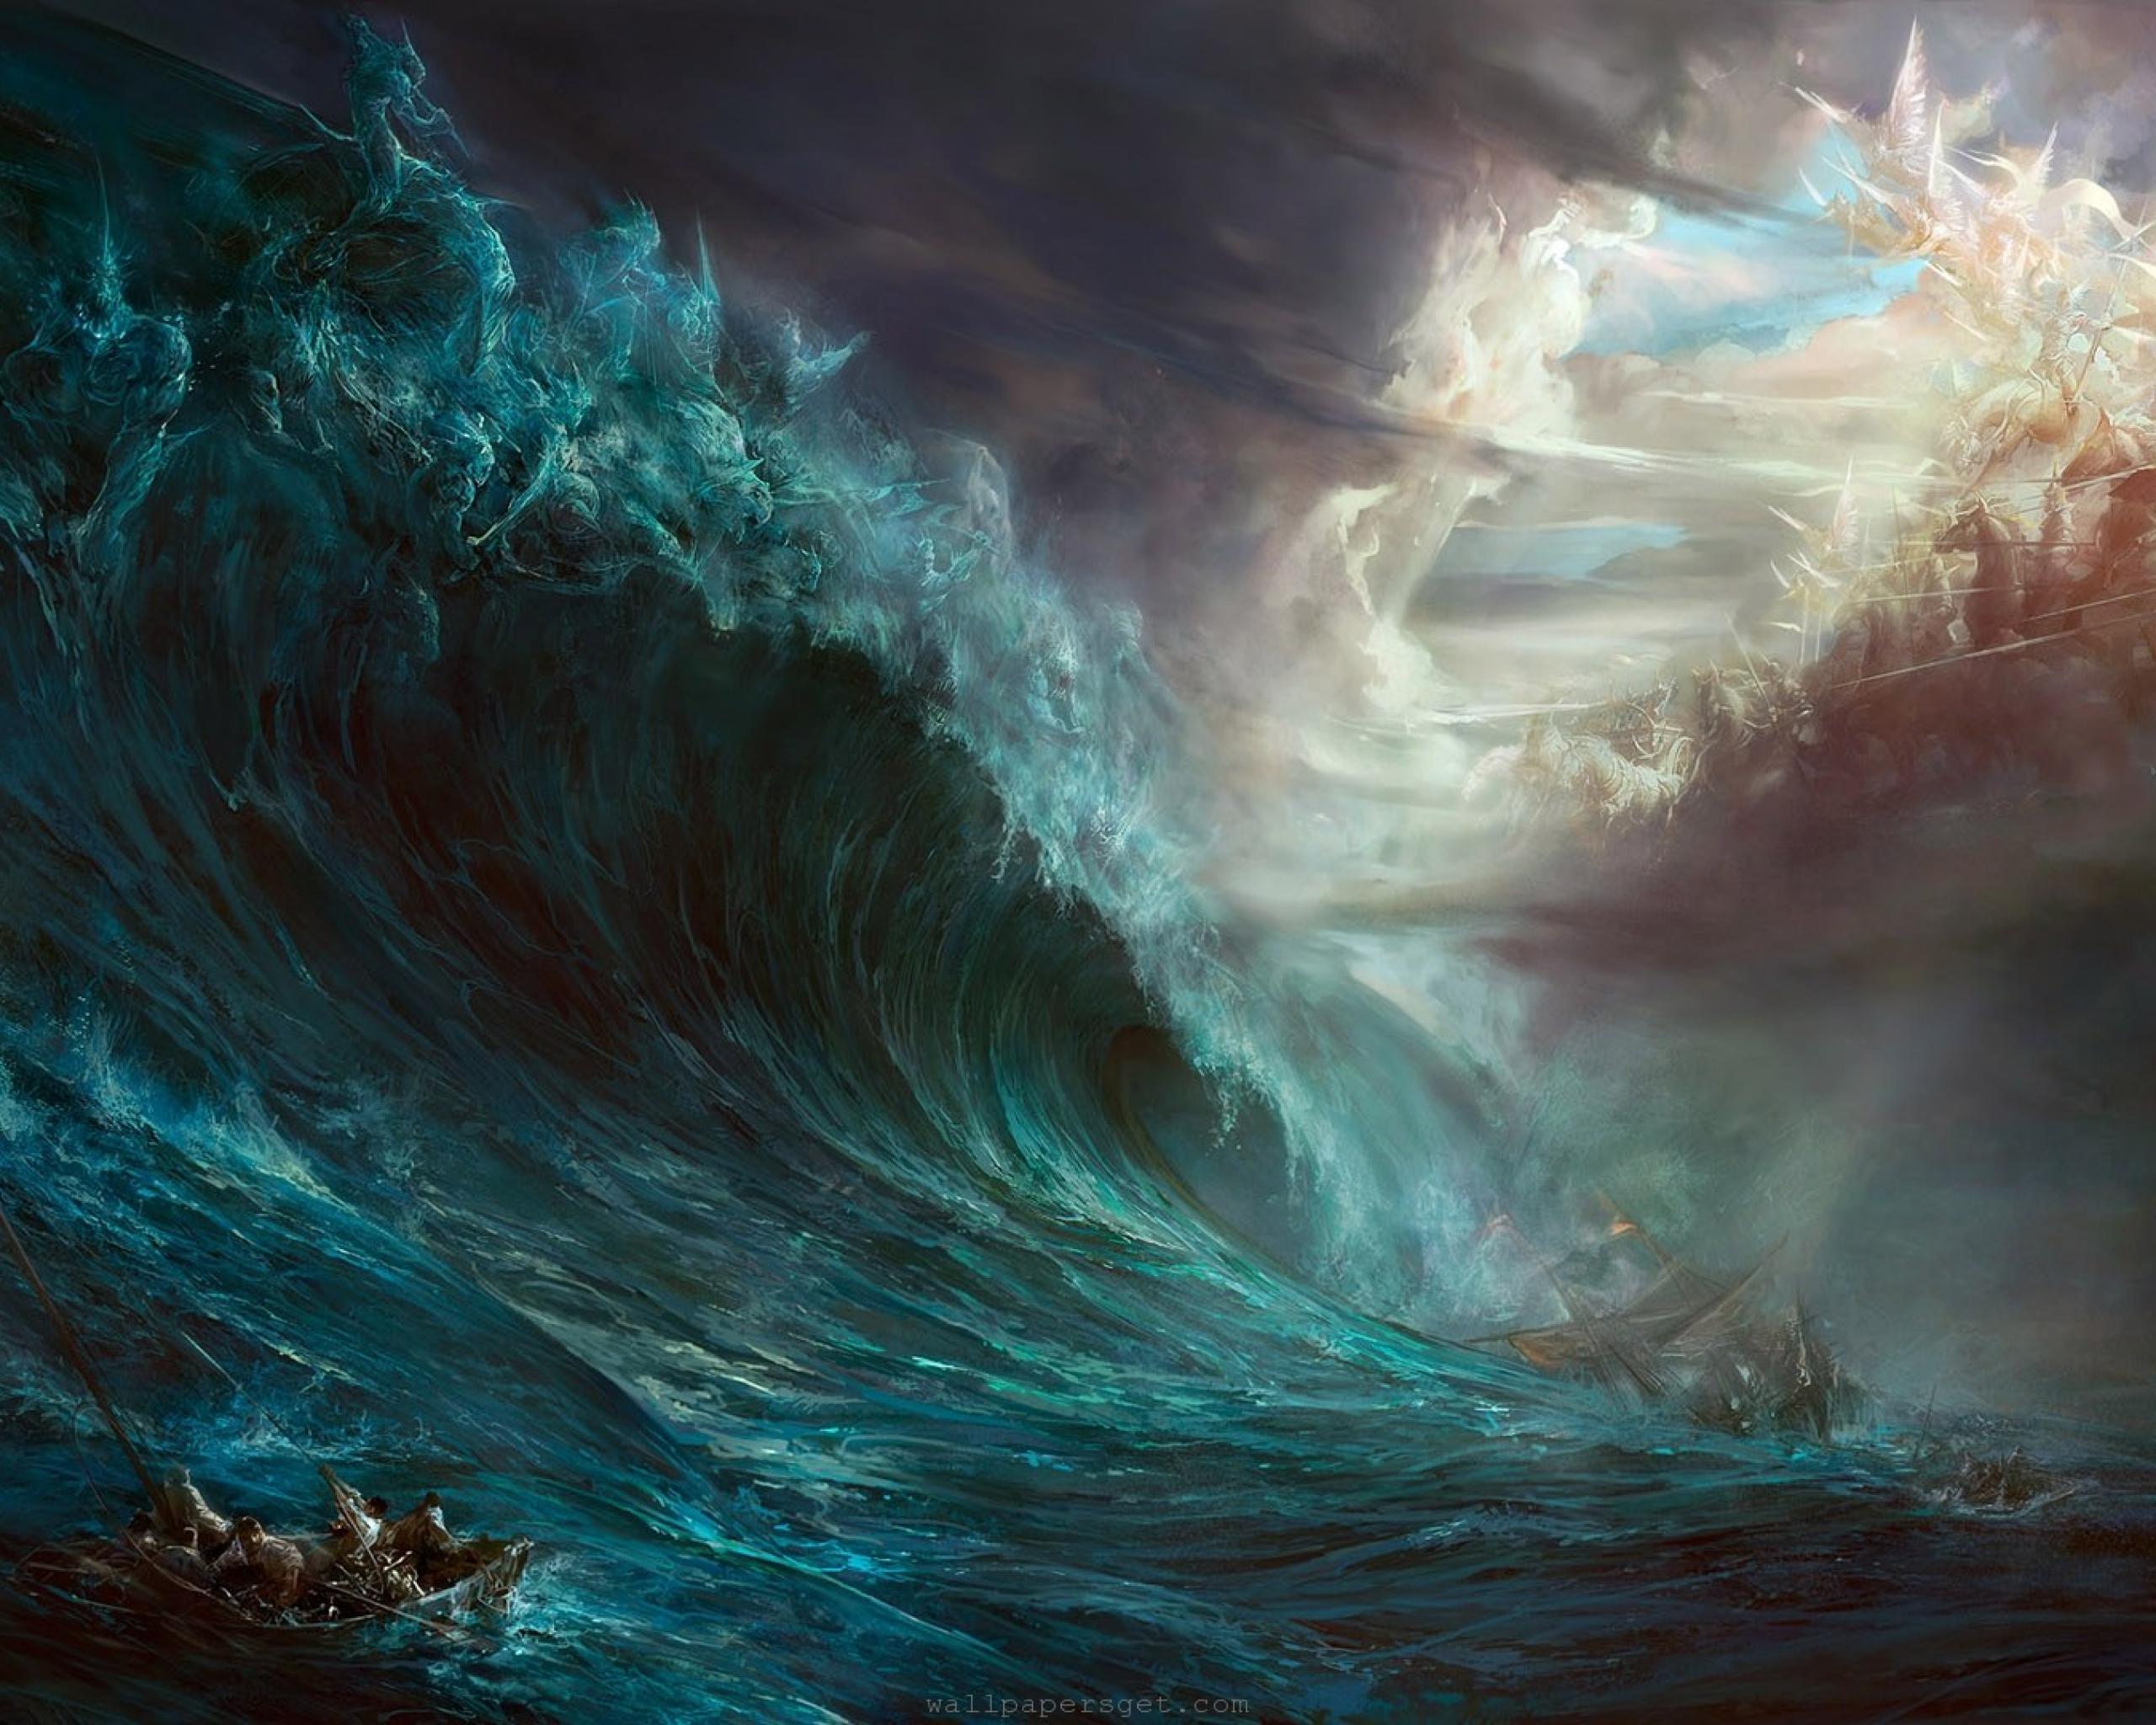 Amazing Wallpaper Horse Ocean - anime-backgrounds-battle-administration-waves-sandbox-2048x2560  Pictures_208459.jpg